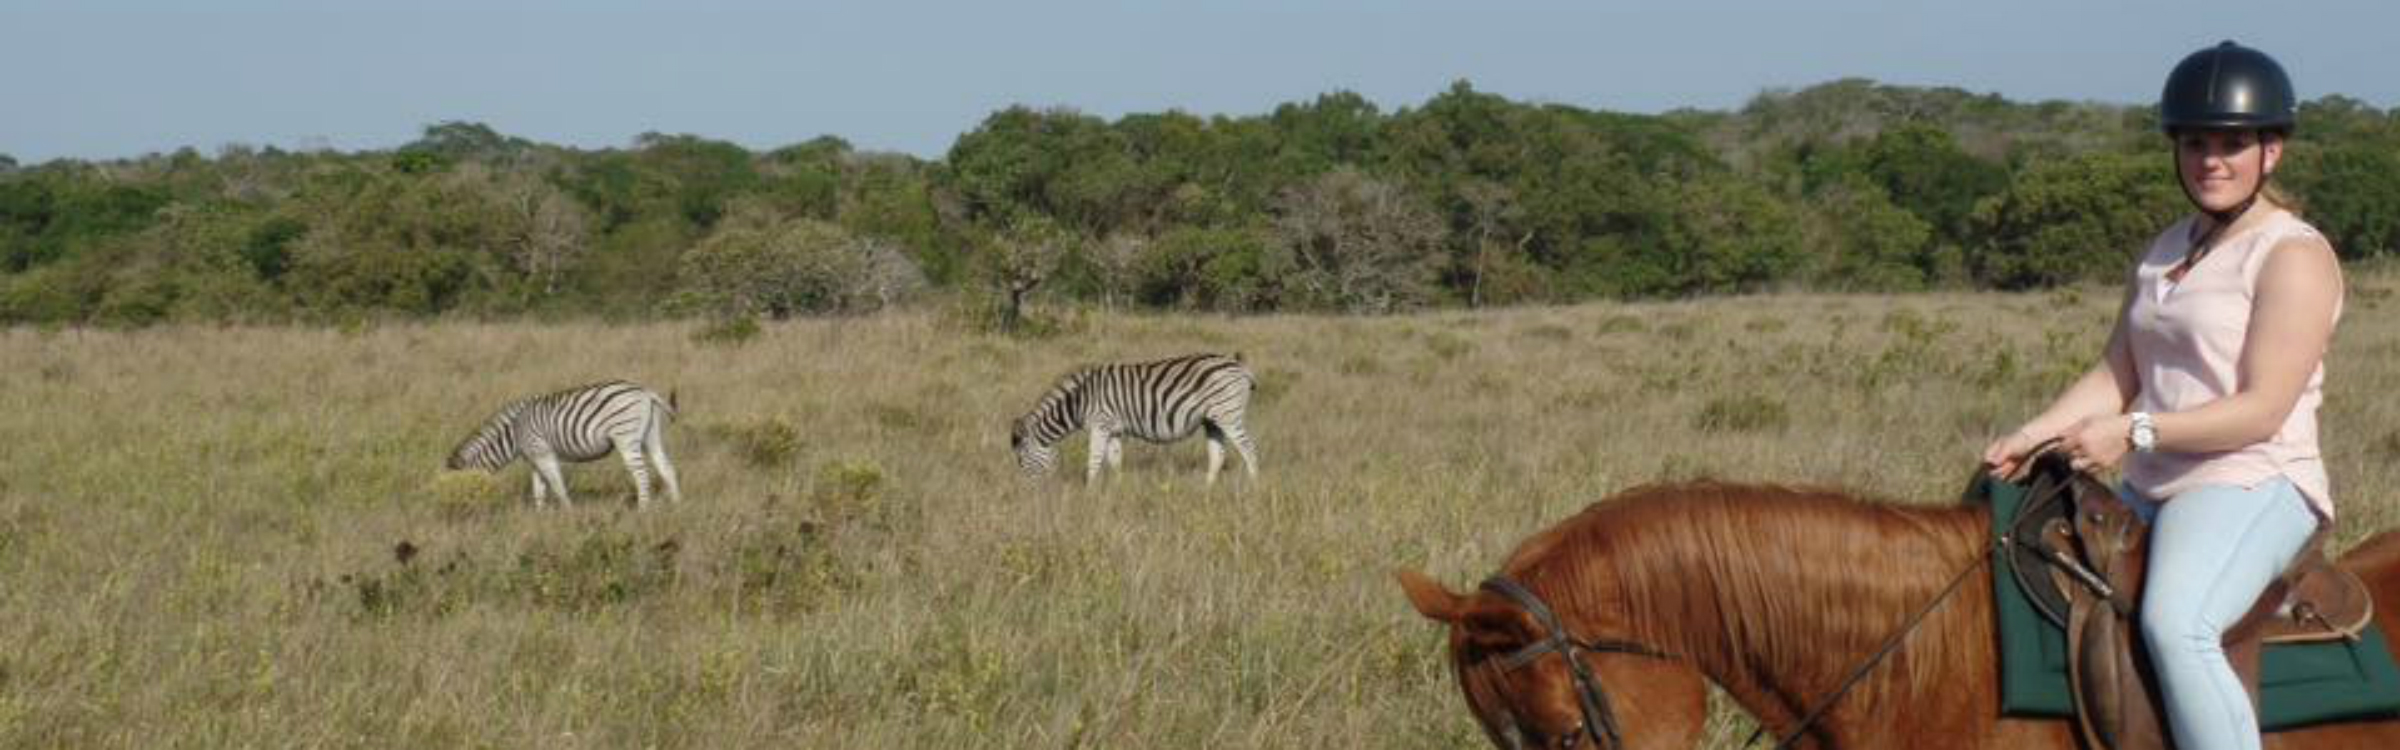 Paardensafari zuid afrika 2400x750